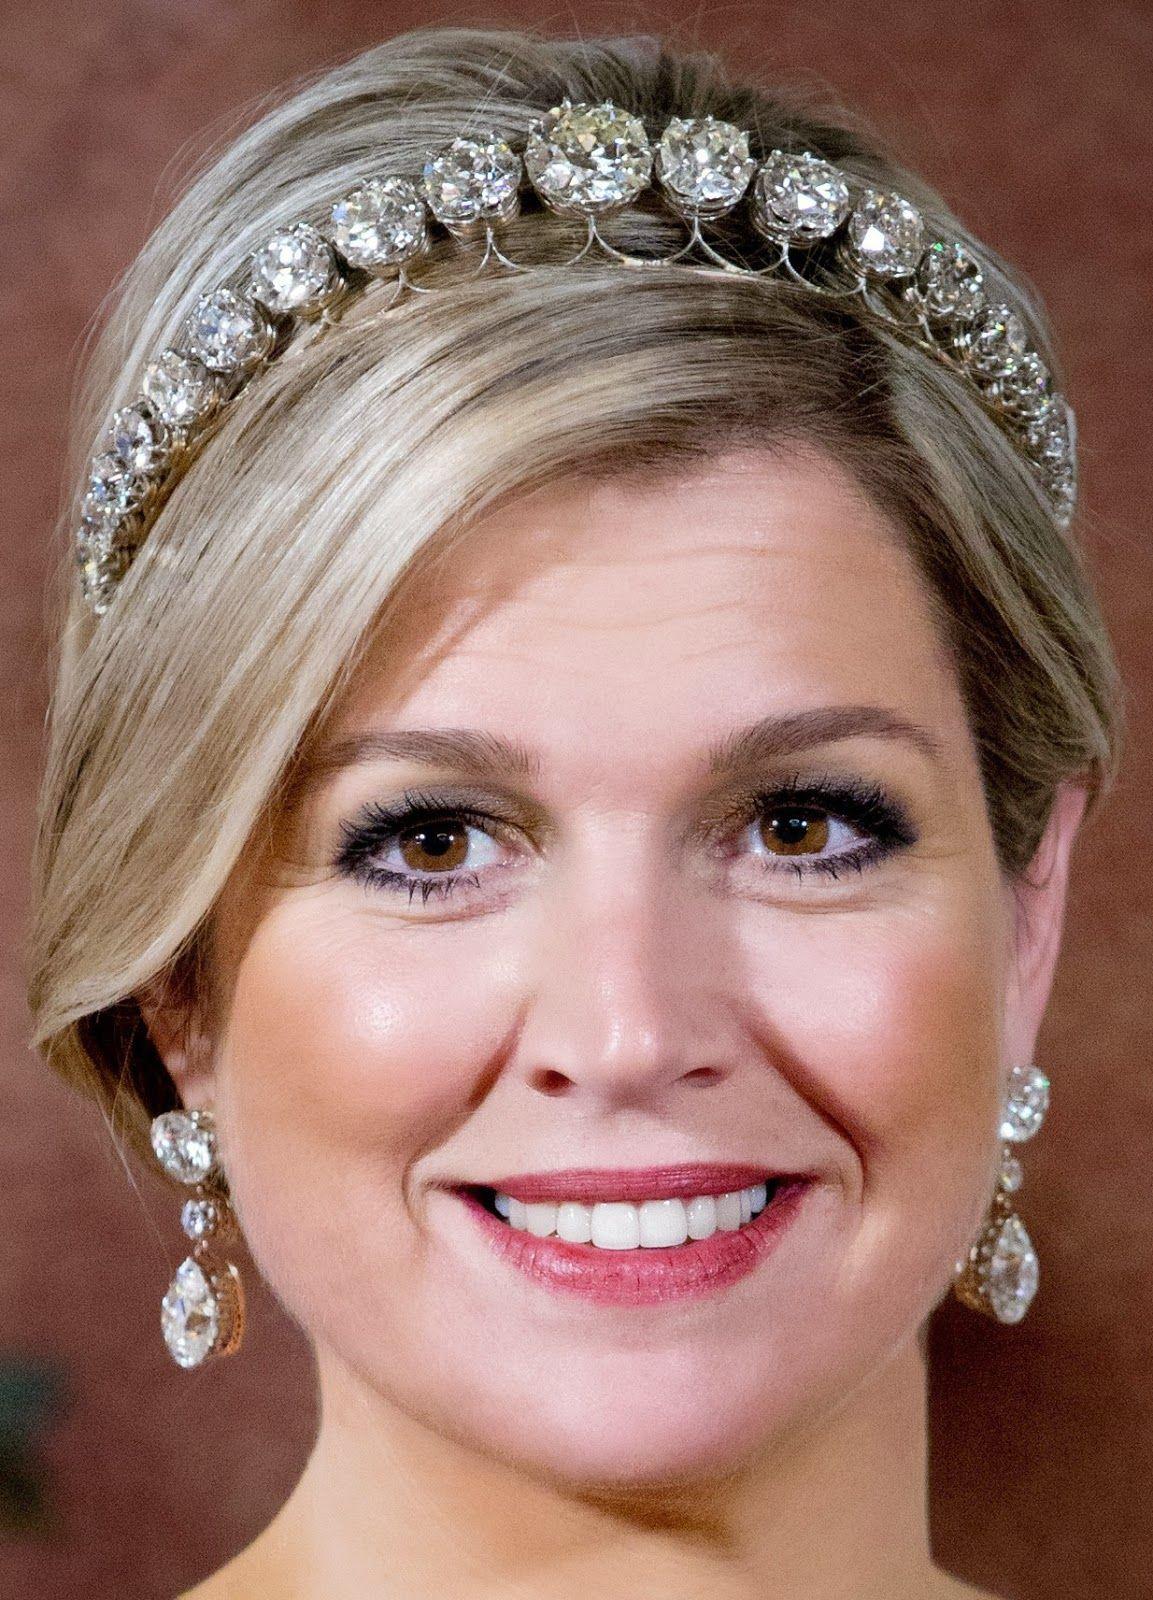 Tiara Mania: Diamond Bandeau (Queen Maxima) Creation: This tiara was ...